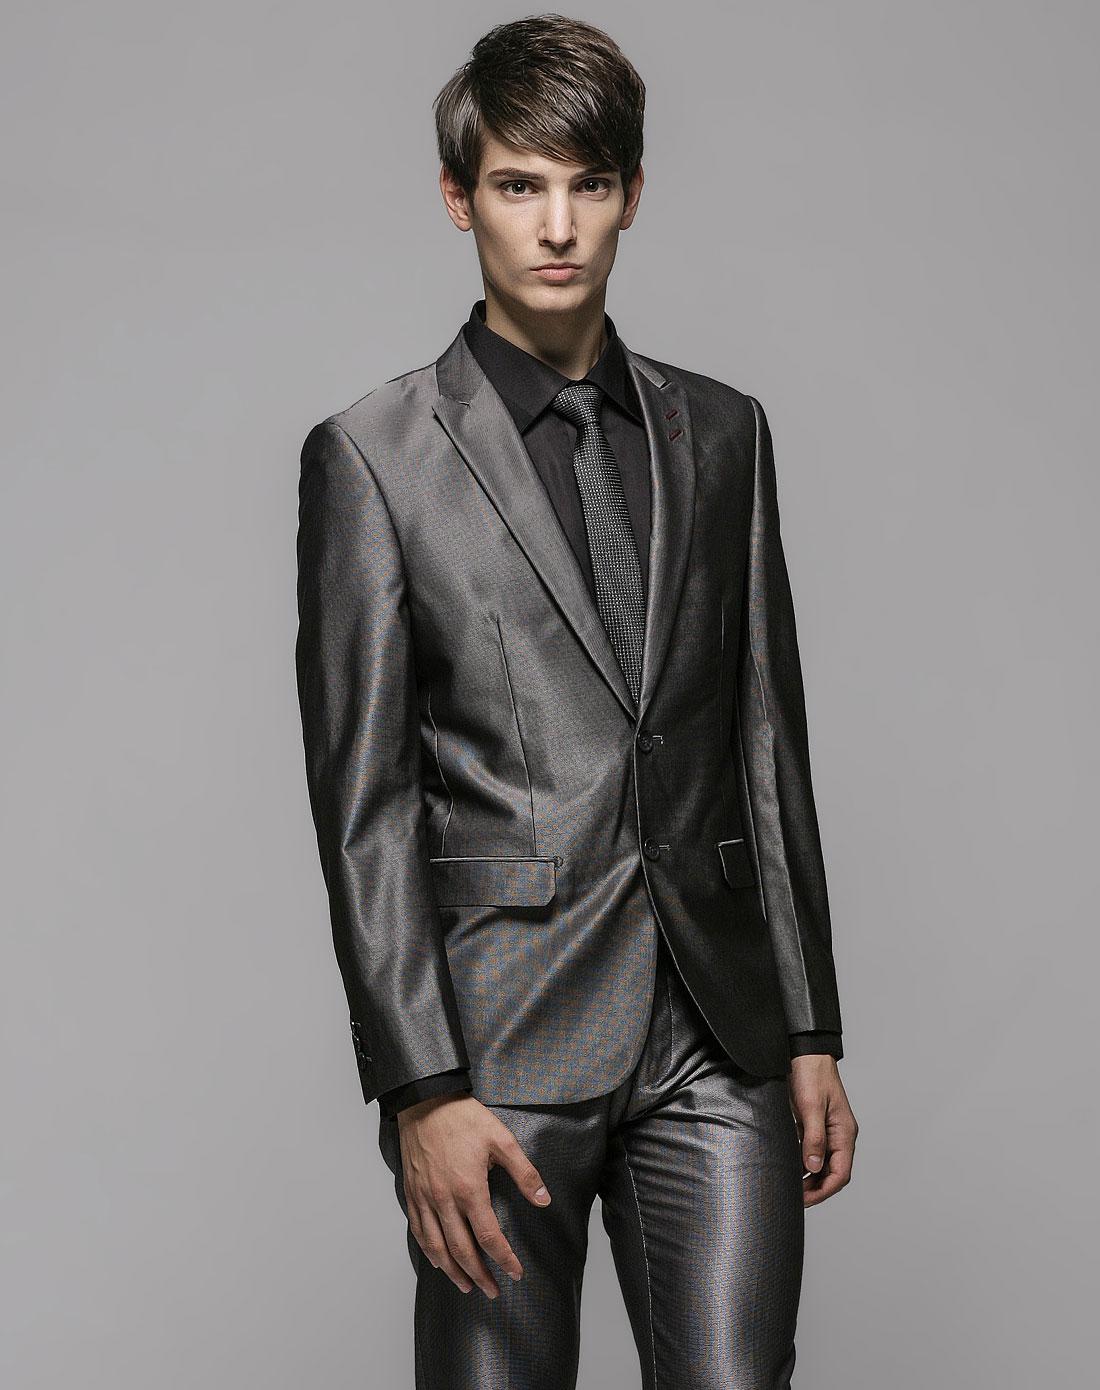 gxg&gxg.1978男装混合专场-灰色时尚细格纹长袖西服